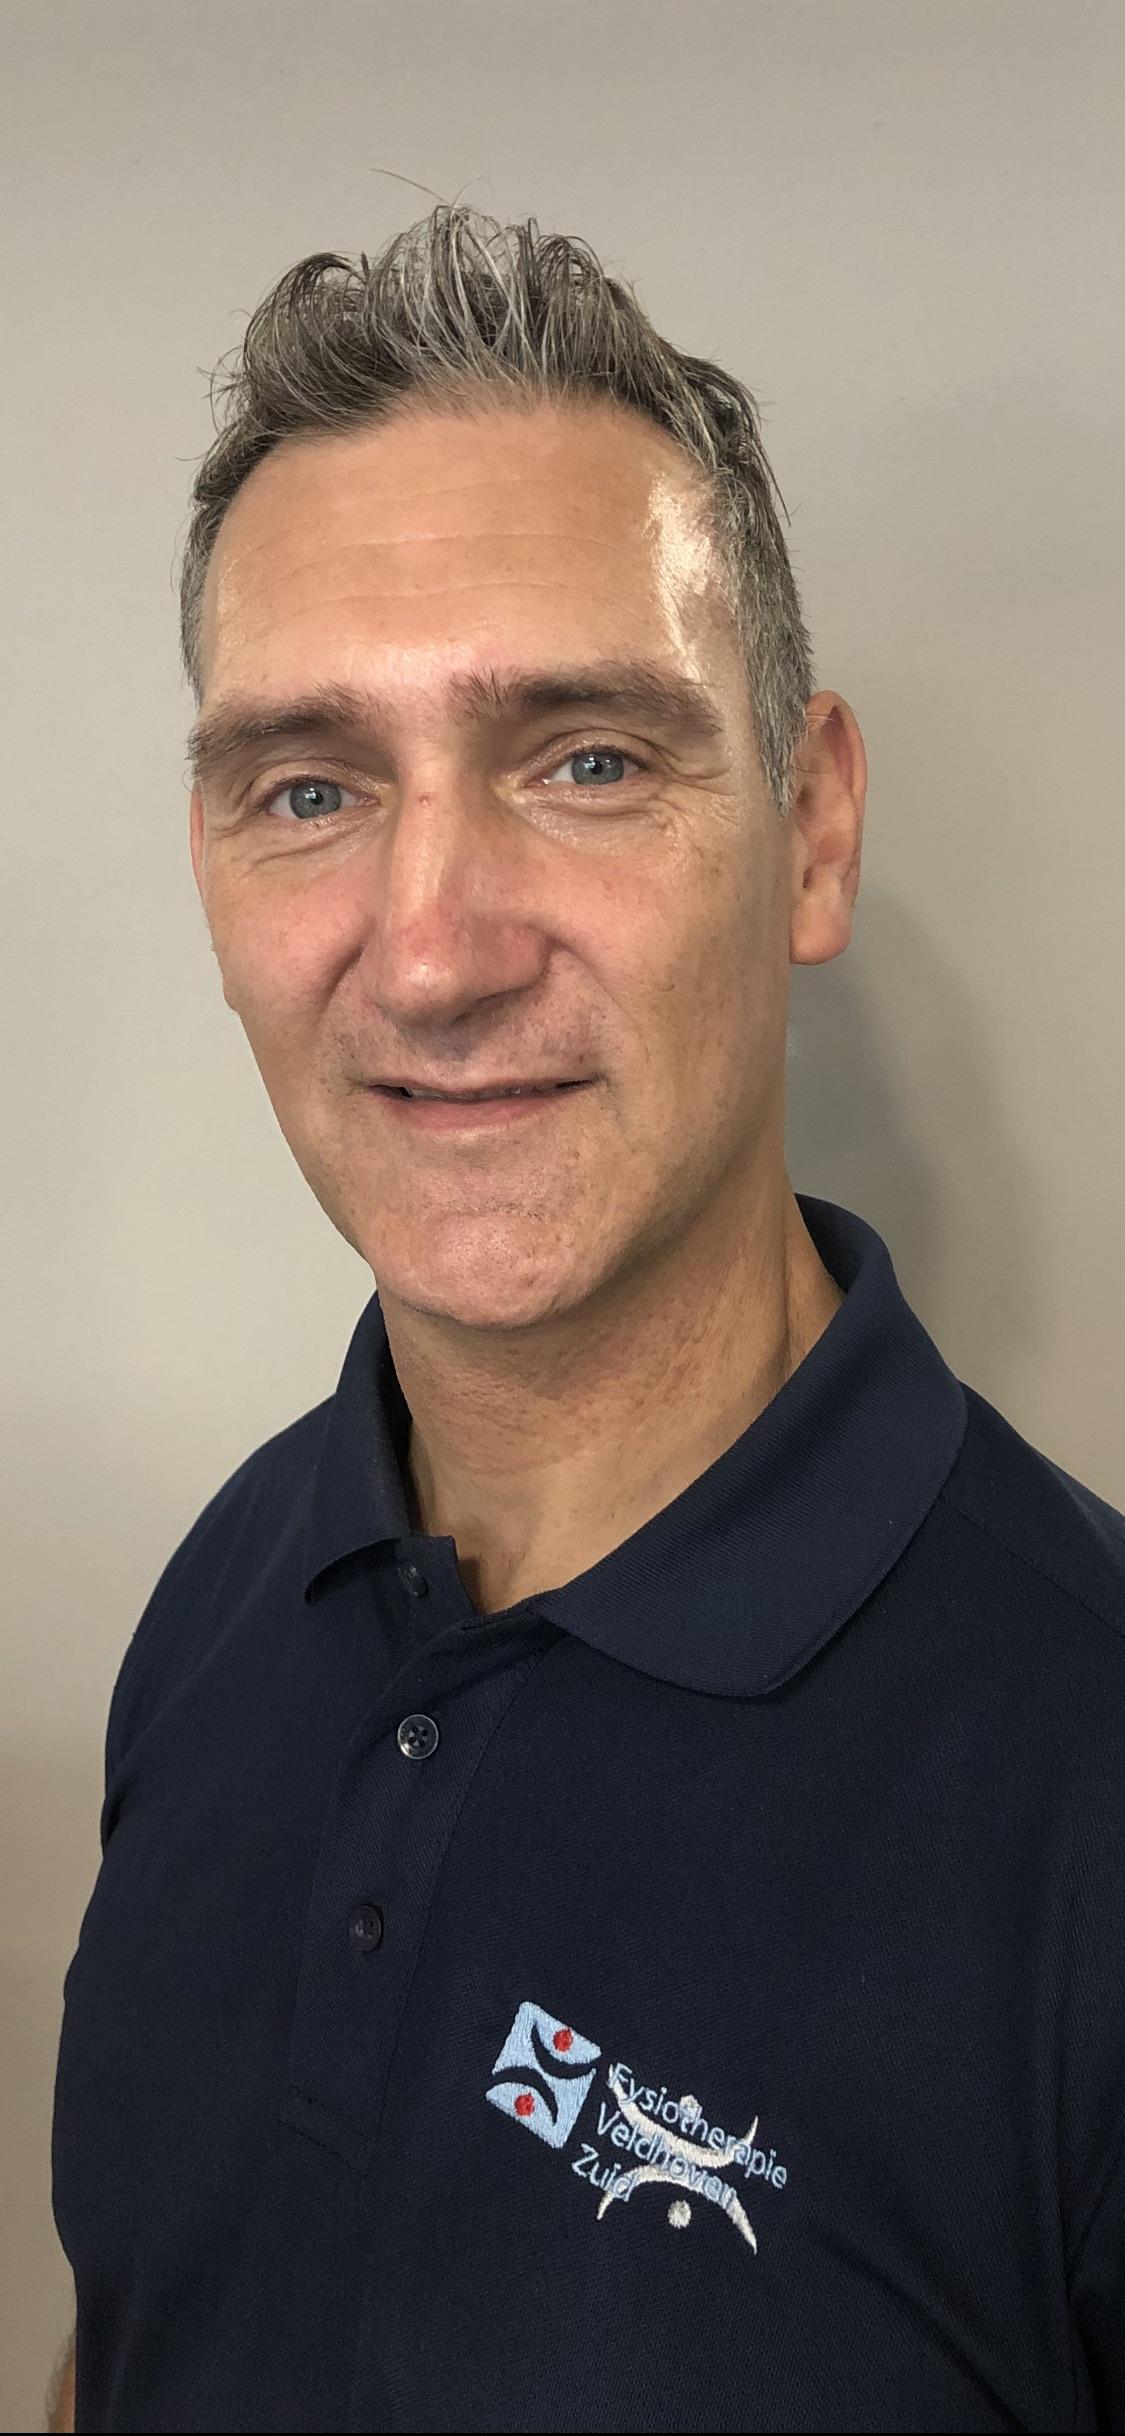 Kennismaking Mark Haagen